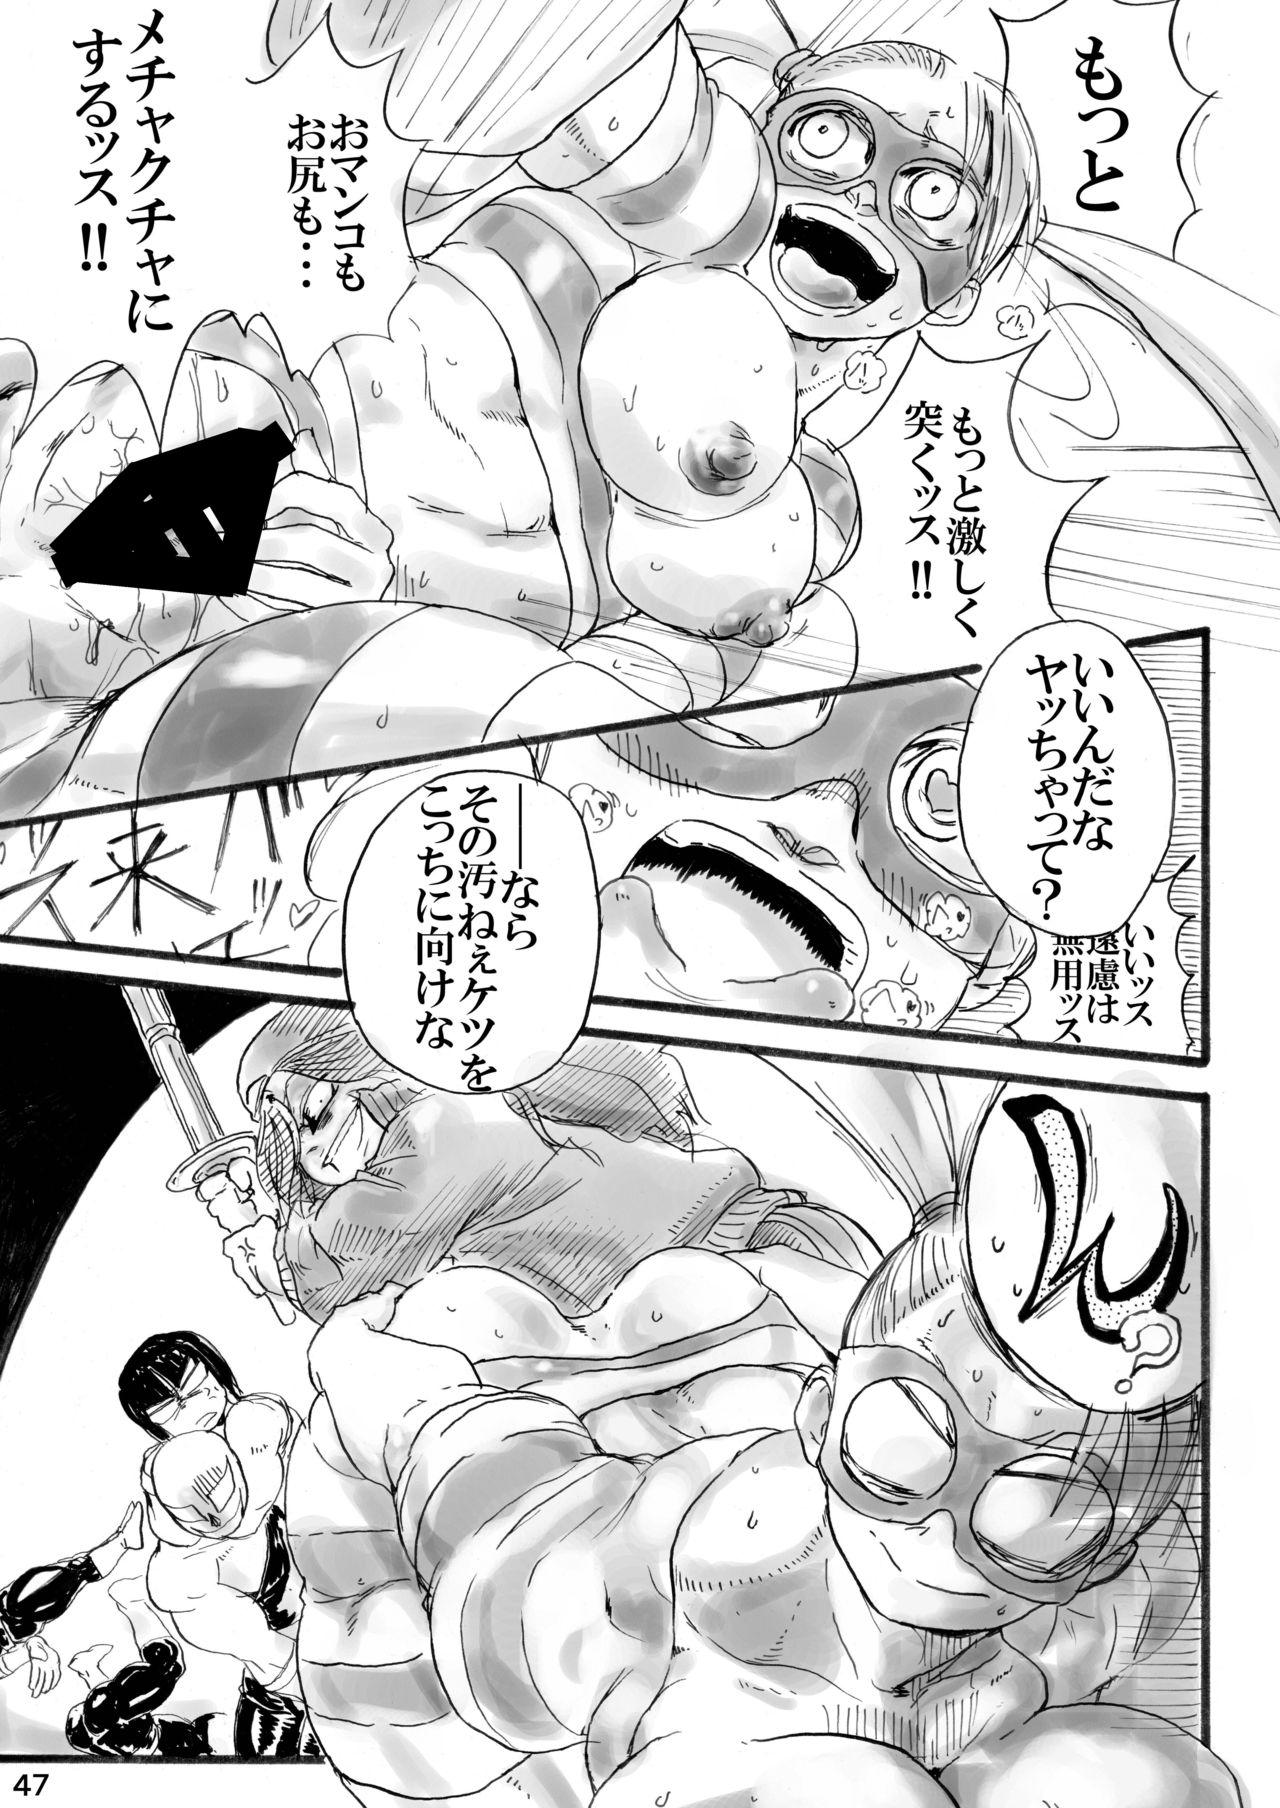 CA〇COM(&MORE!) VS FIGHTING GIRLS Swimsuit&Gangbang Special 45